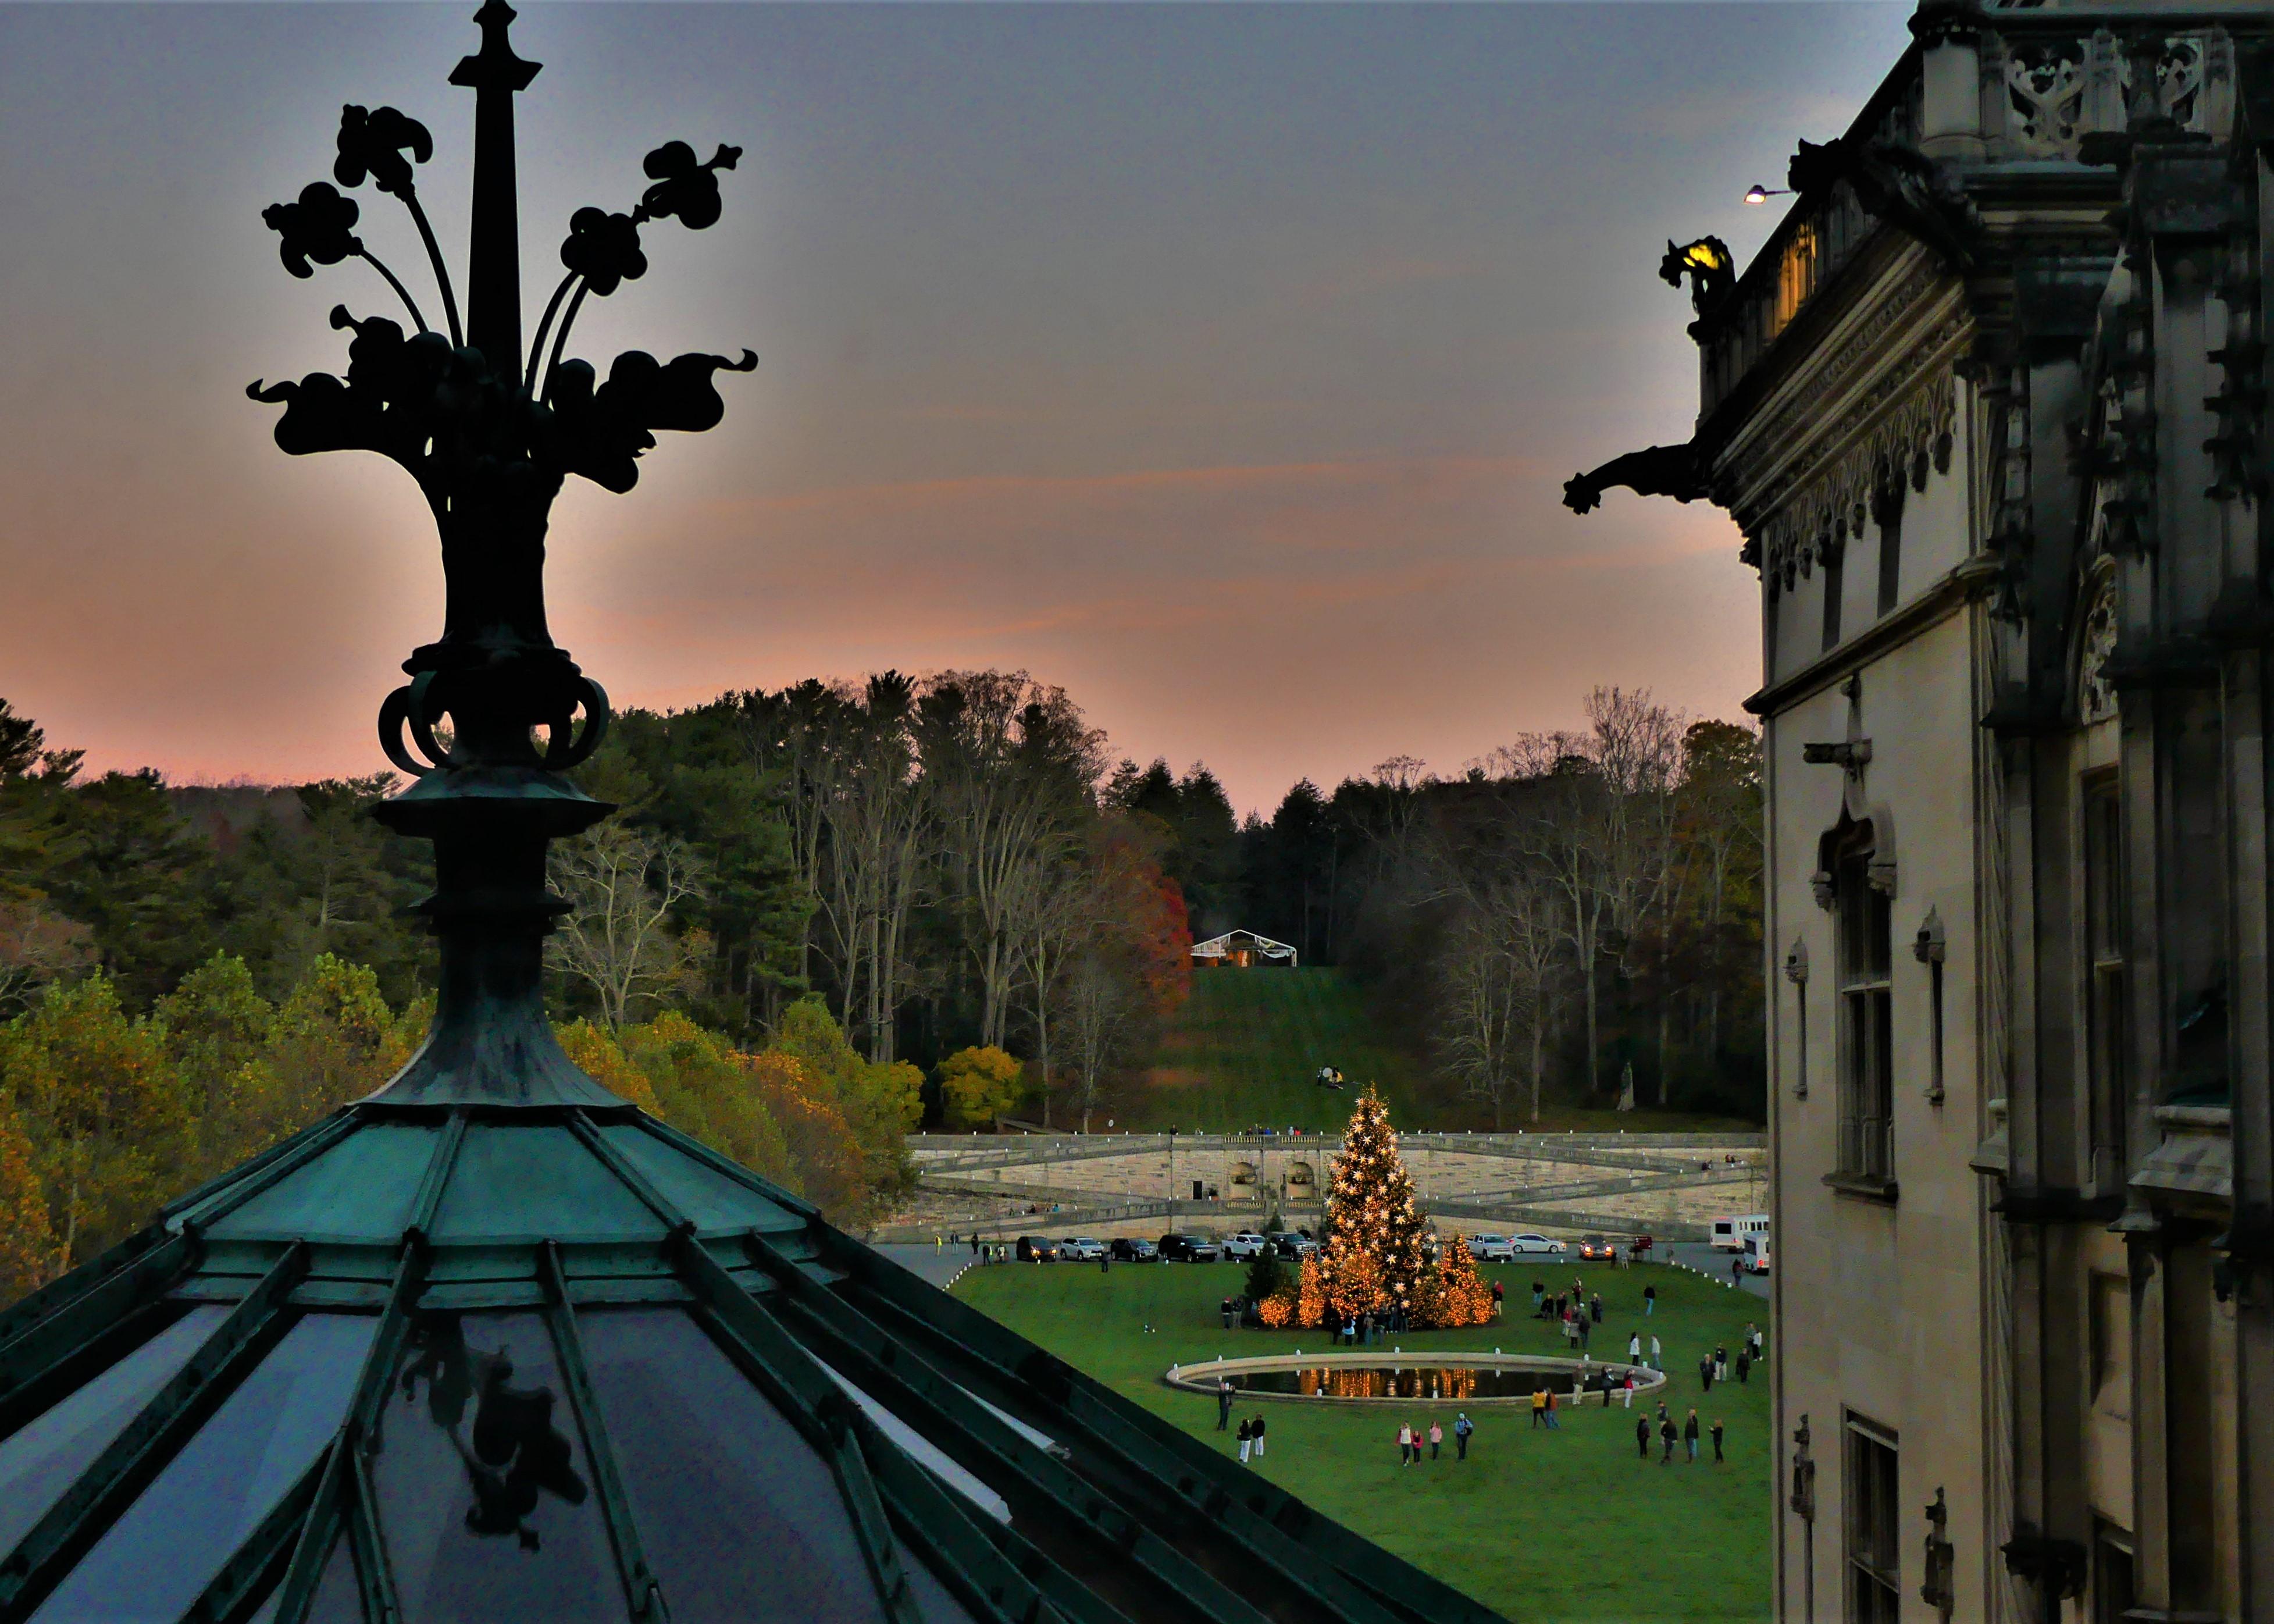 twilight and tree